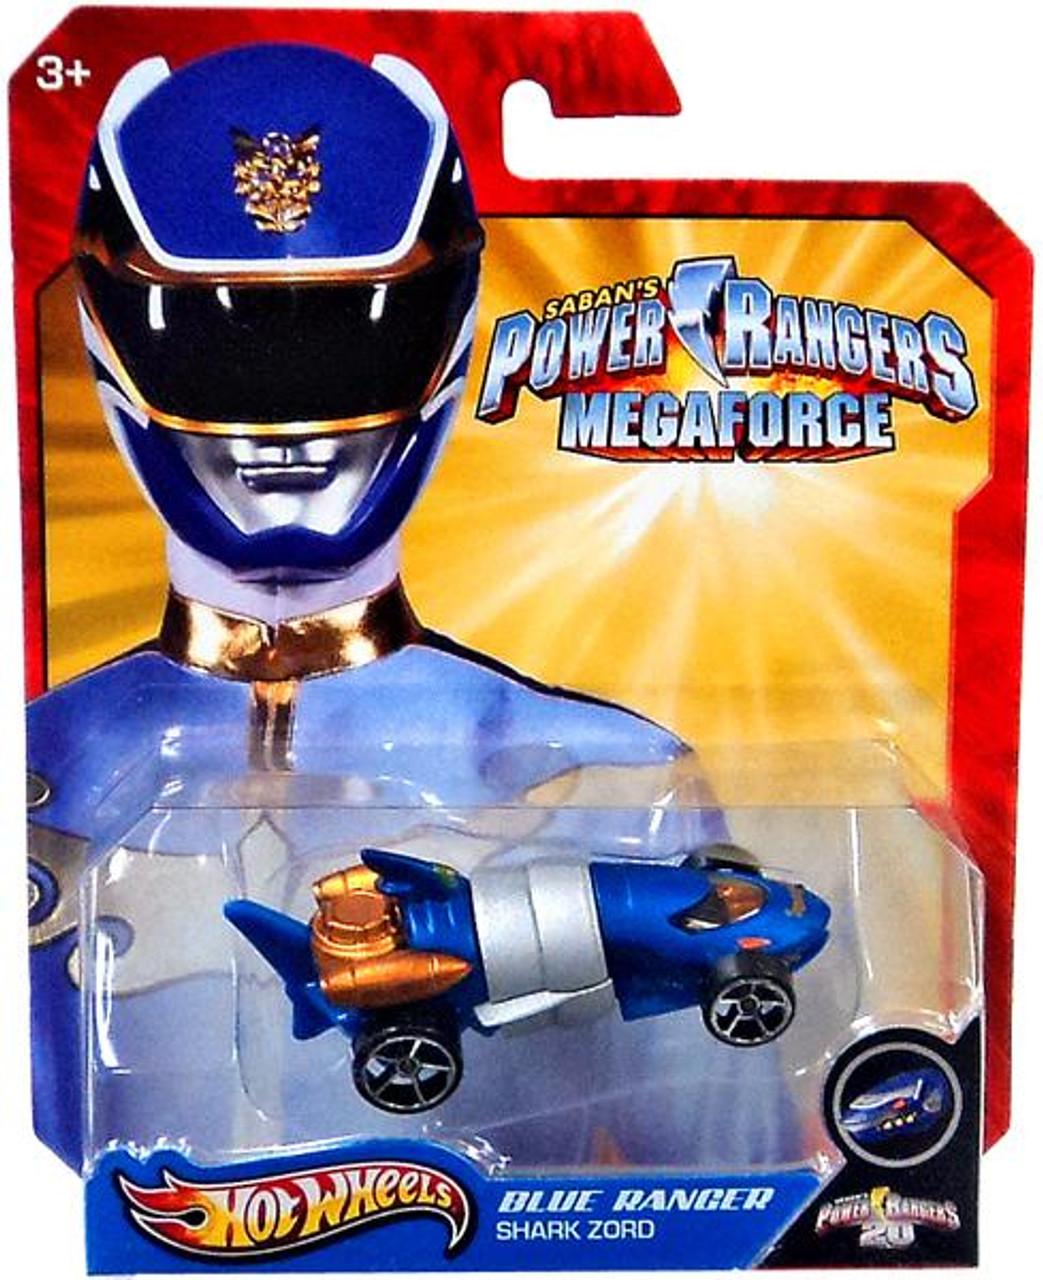 Power Rangers Megaforce Hot Wheels Blue Ranger Shark Zord Diecast Car